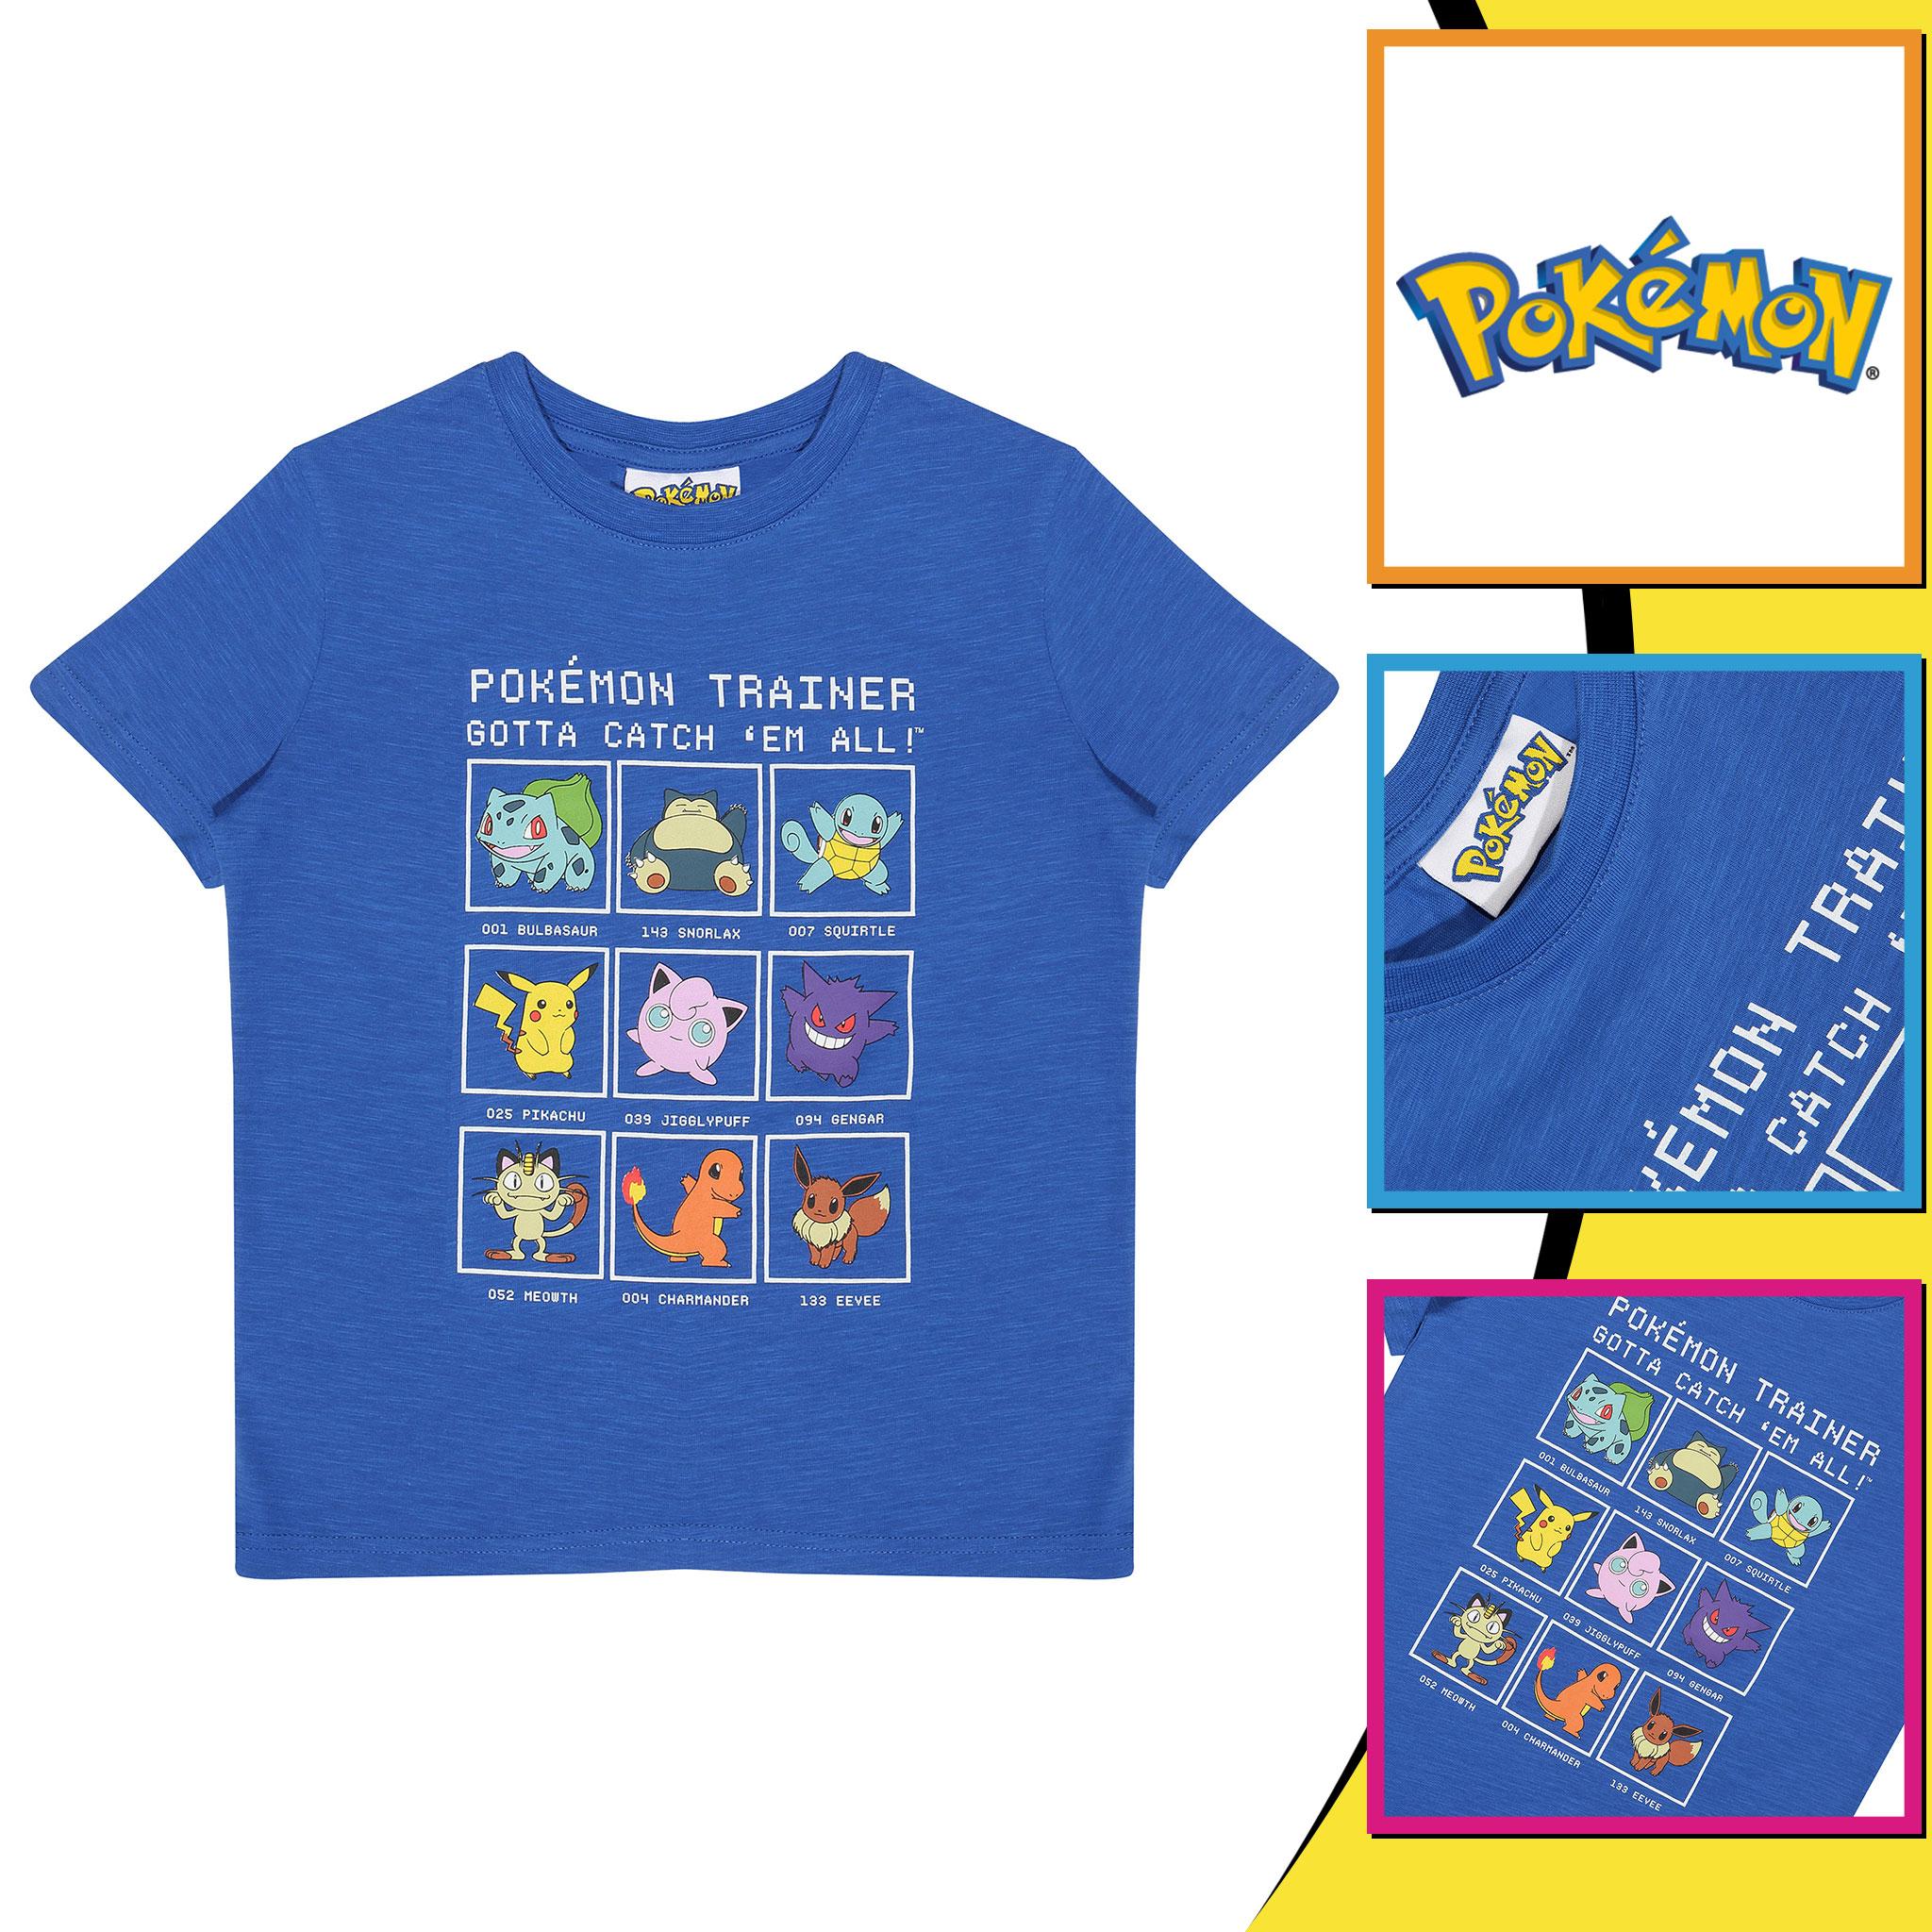 miniature 7 - Boys Pokemon T Shirt Trainer Official Blue